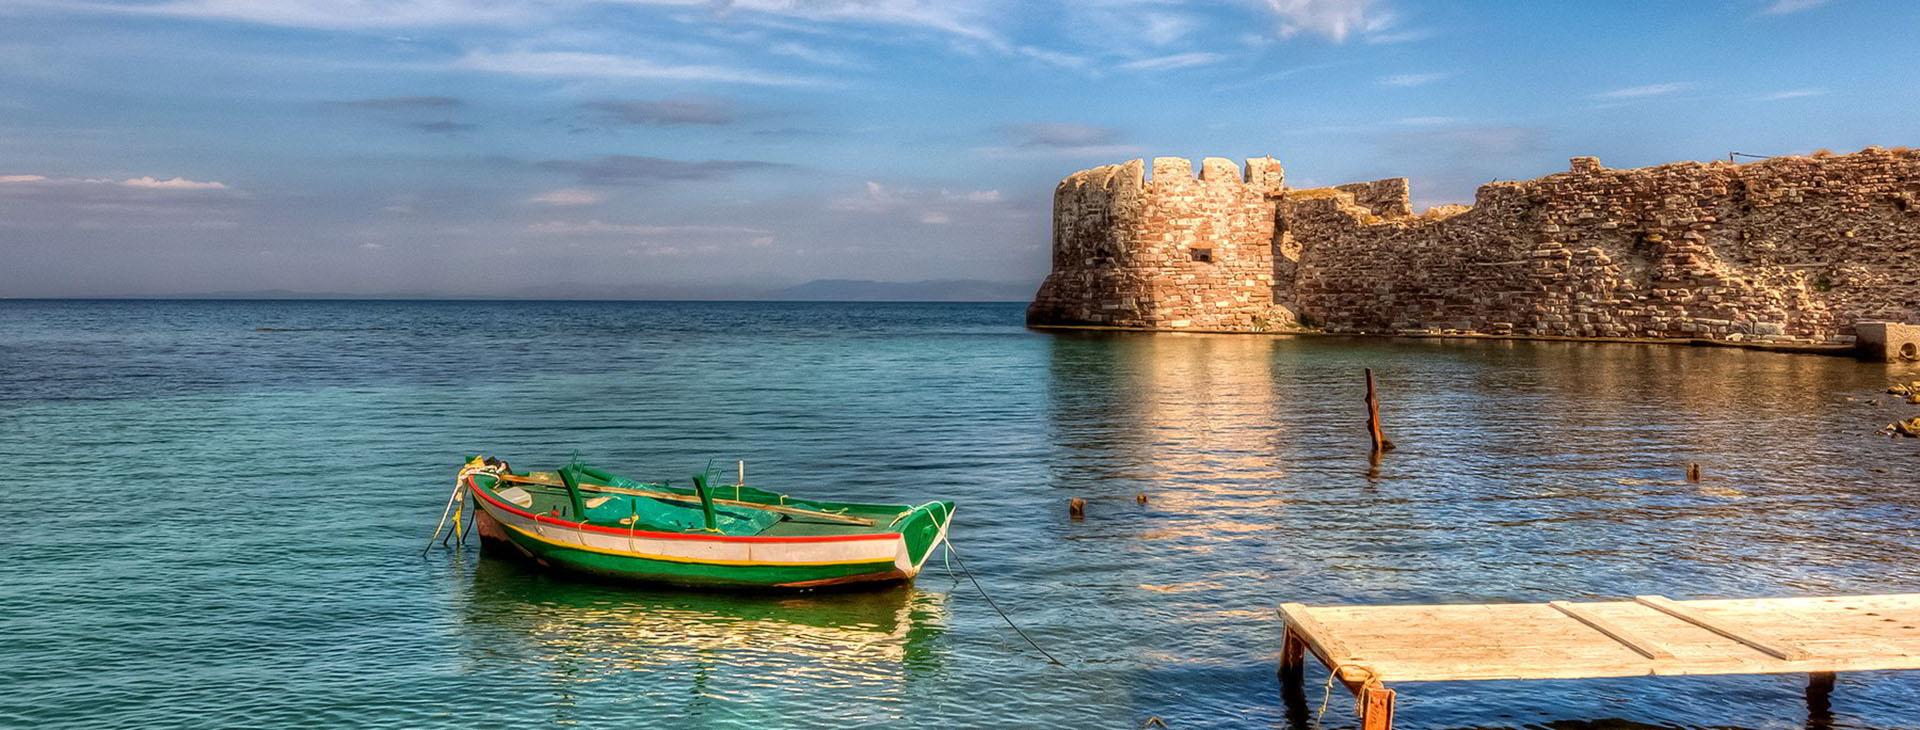 Caste of Lesvos, Mytilene, Lesvos island